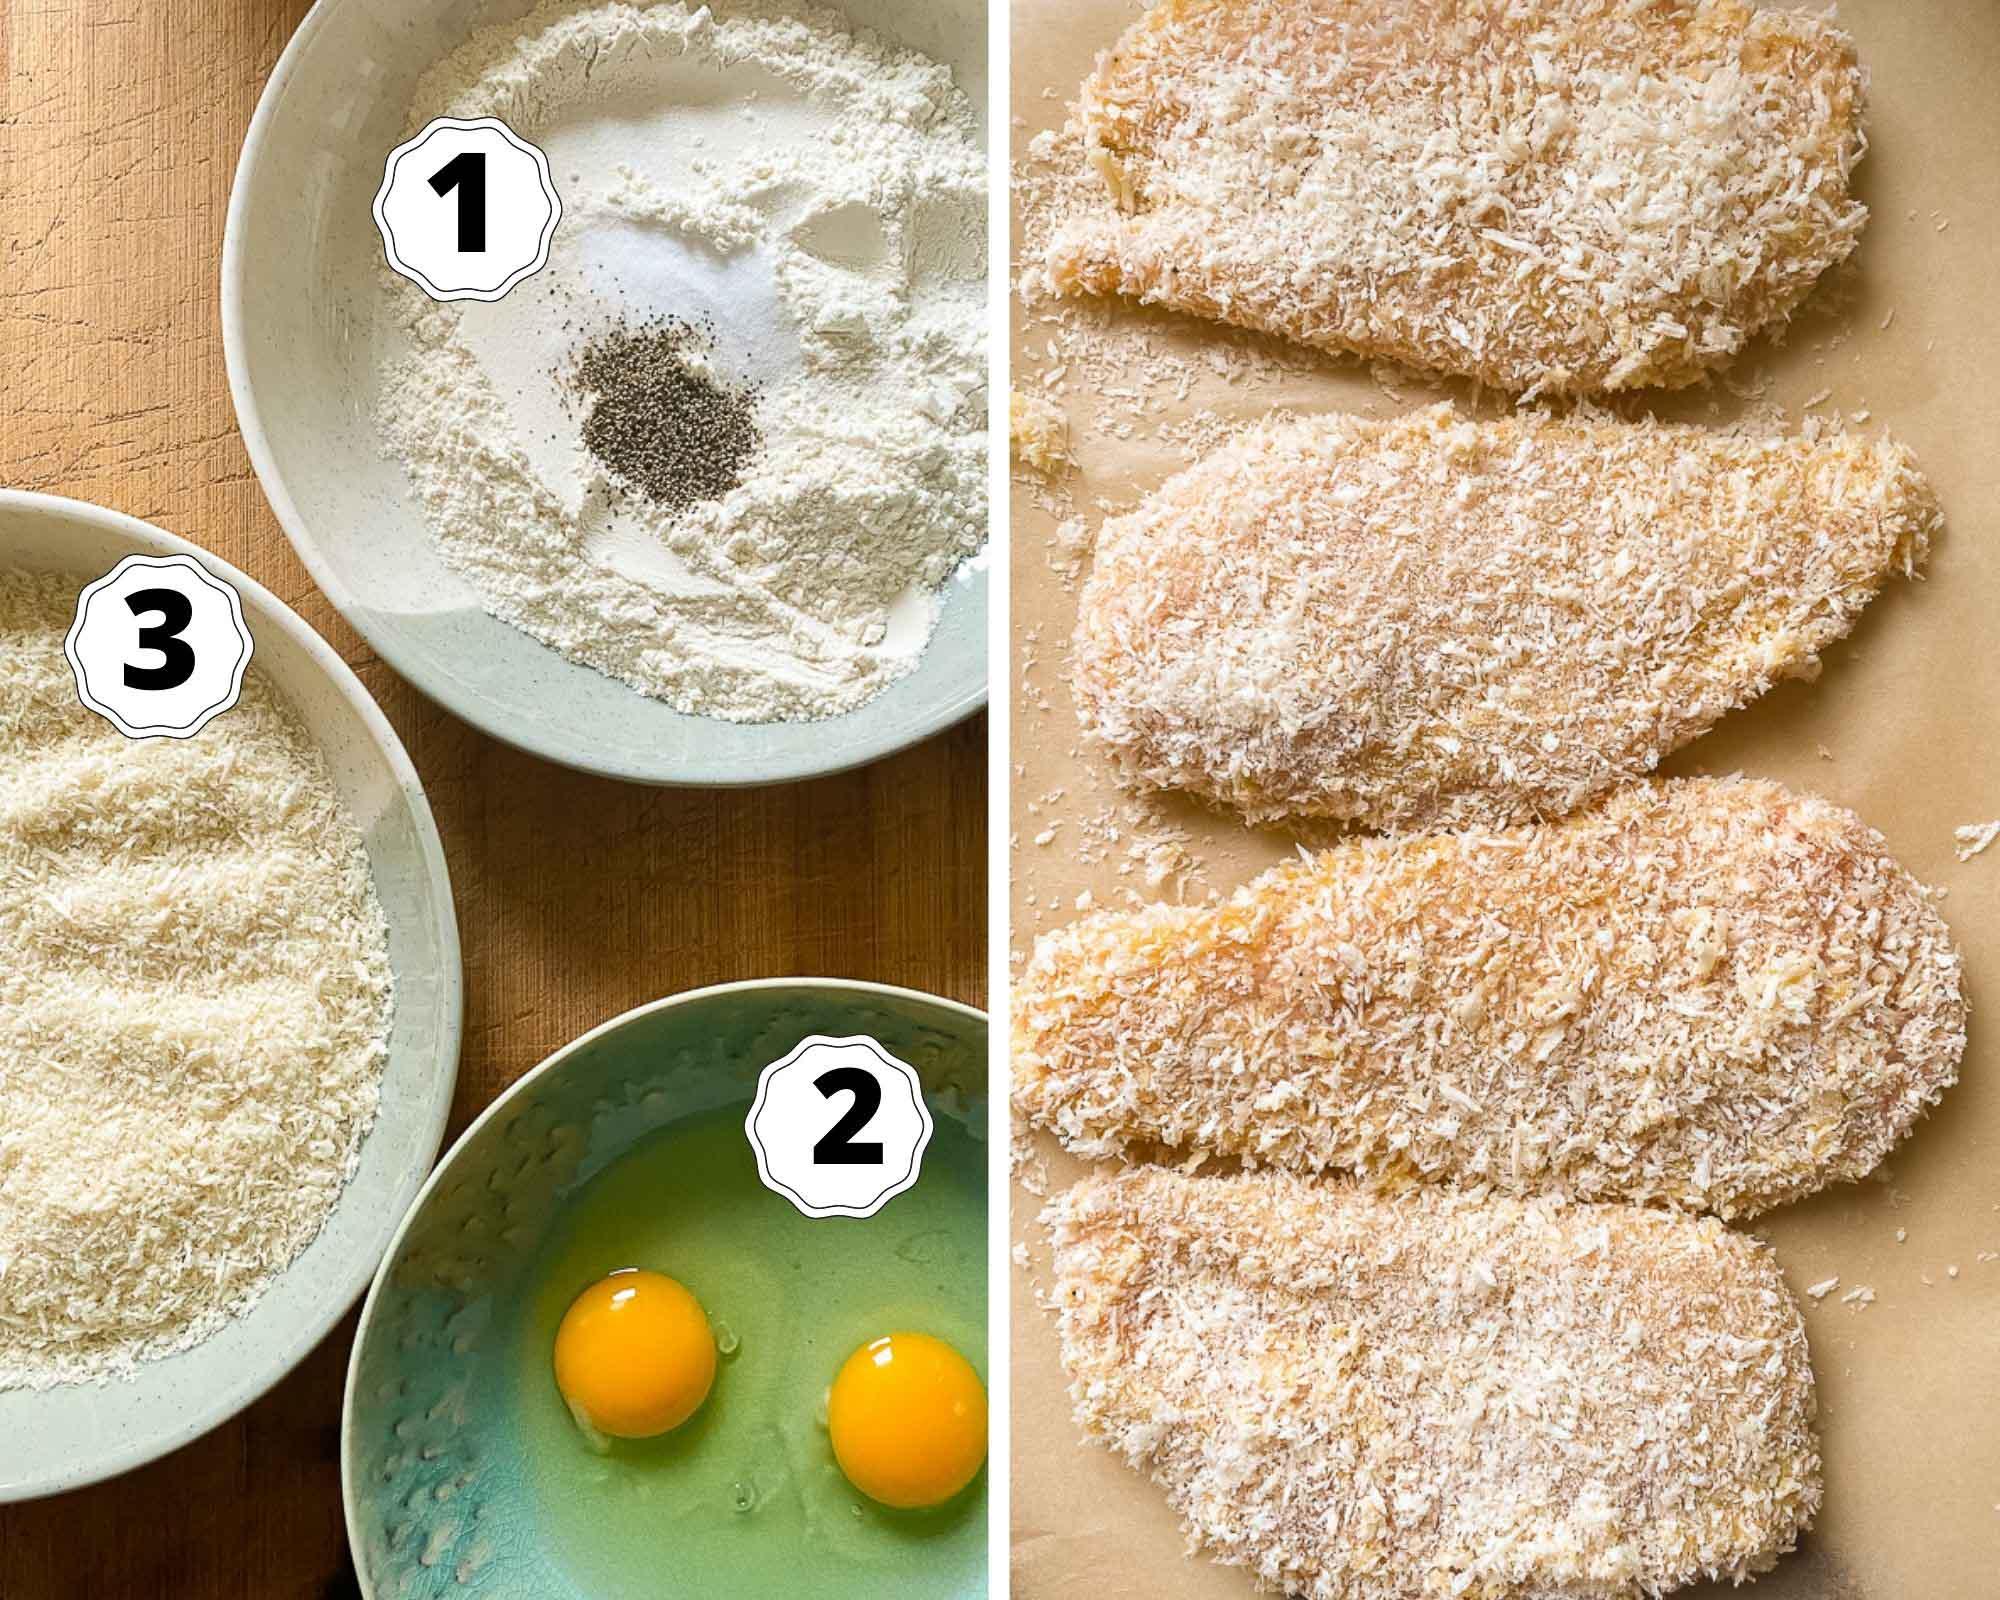 chicken katsu recipe process photos